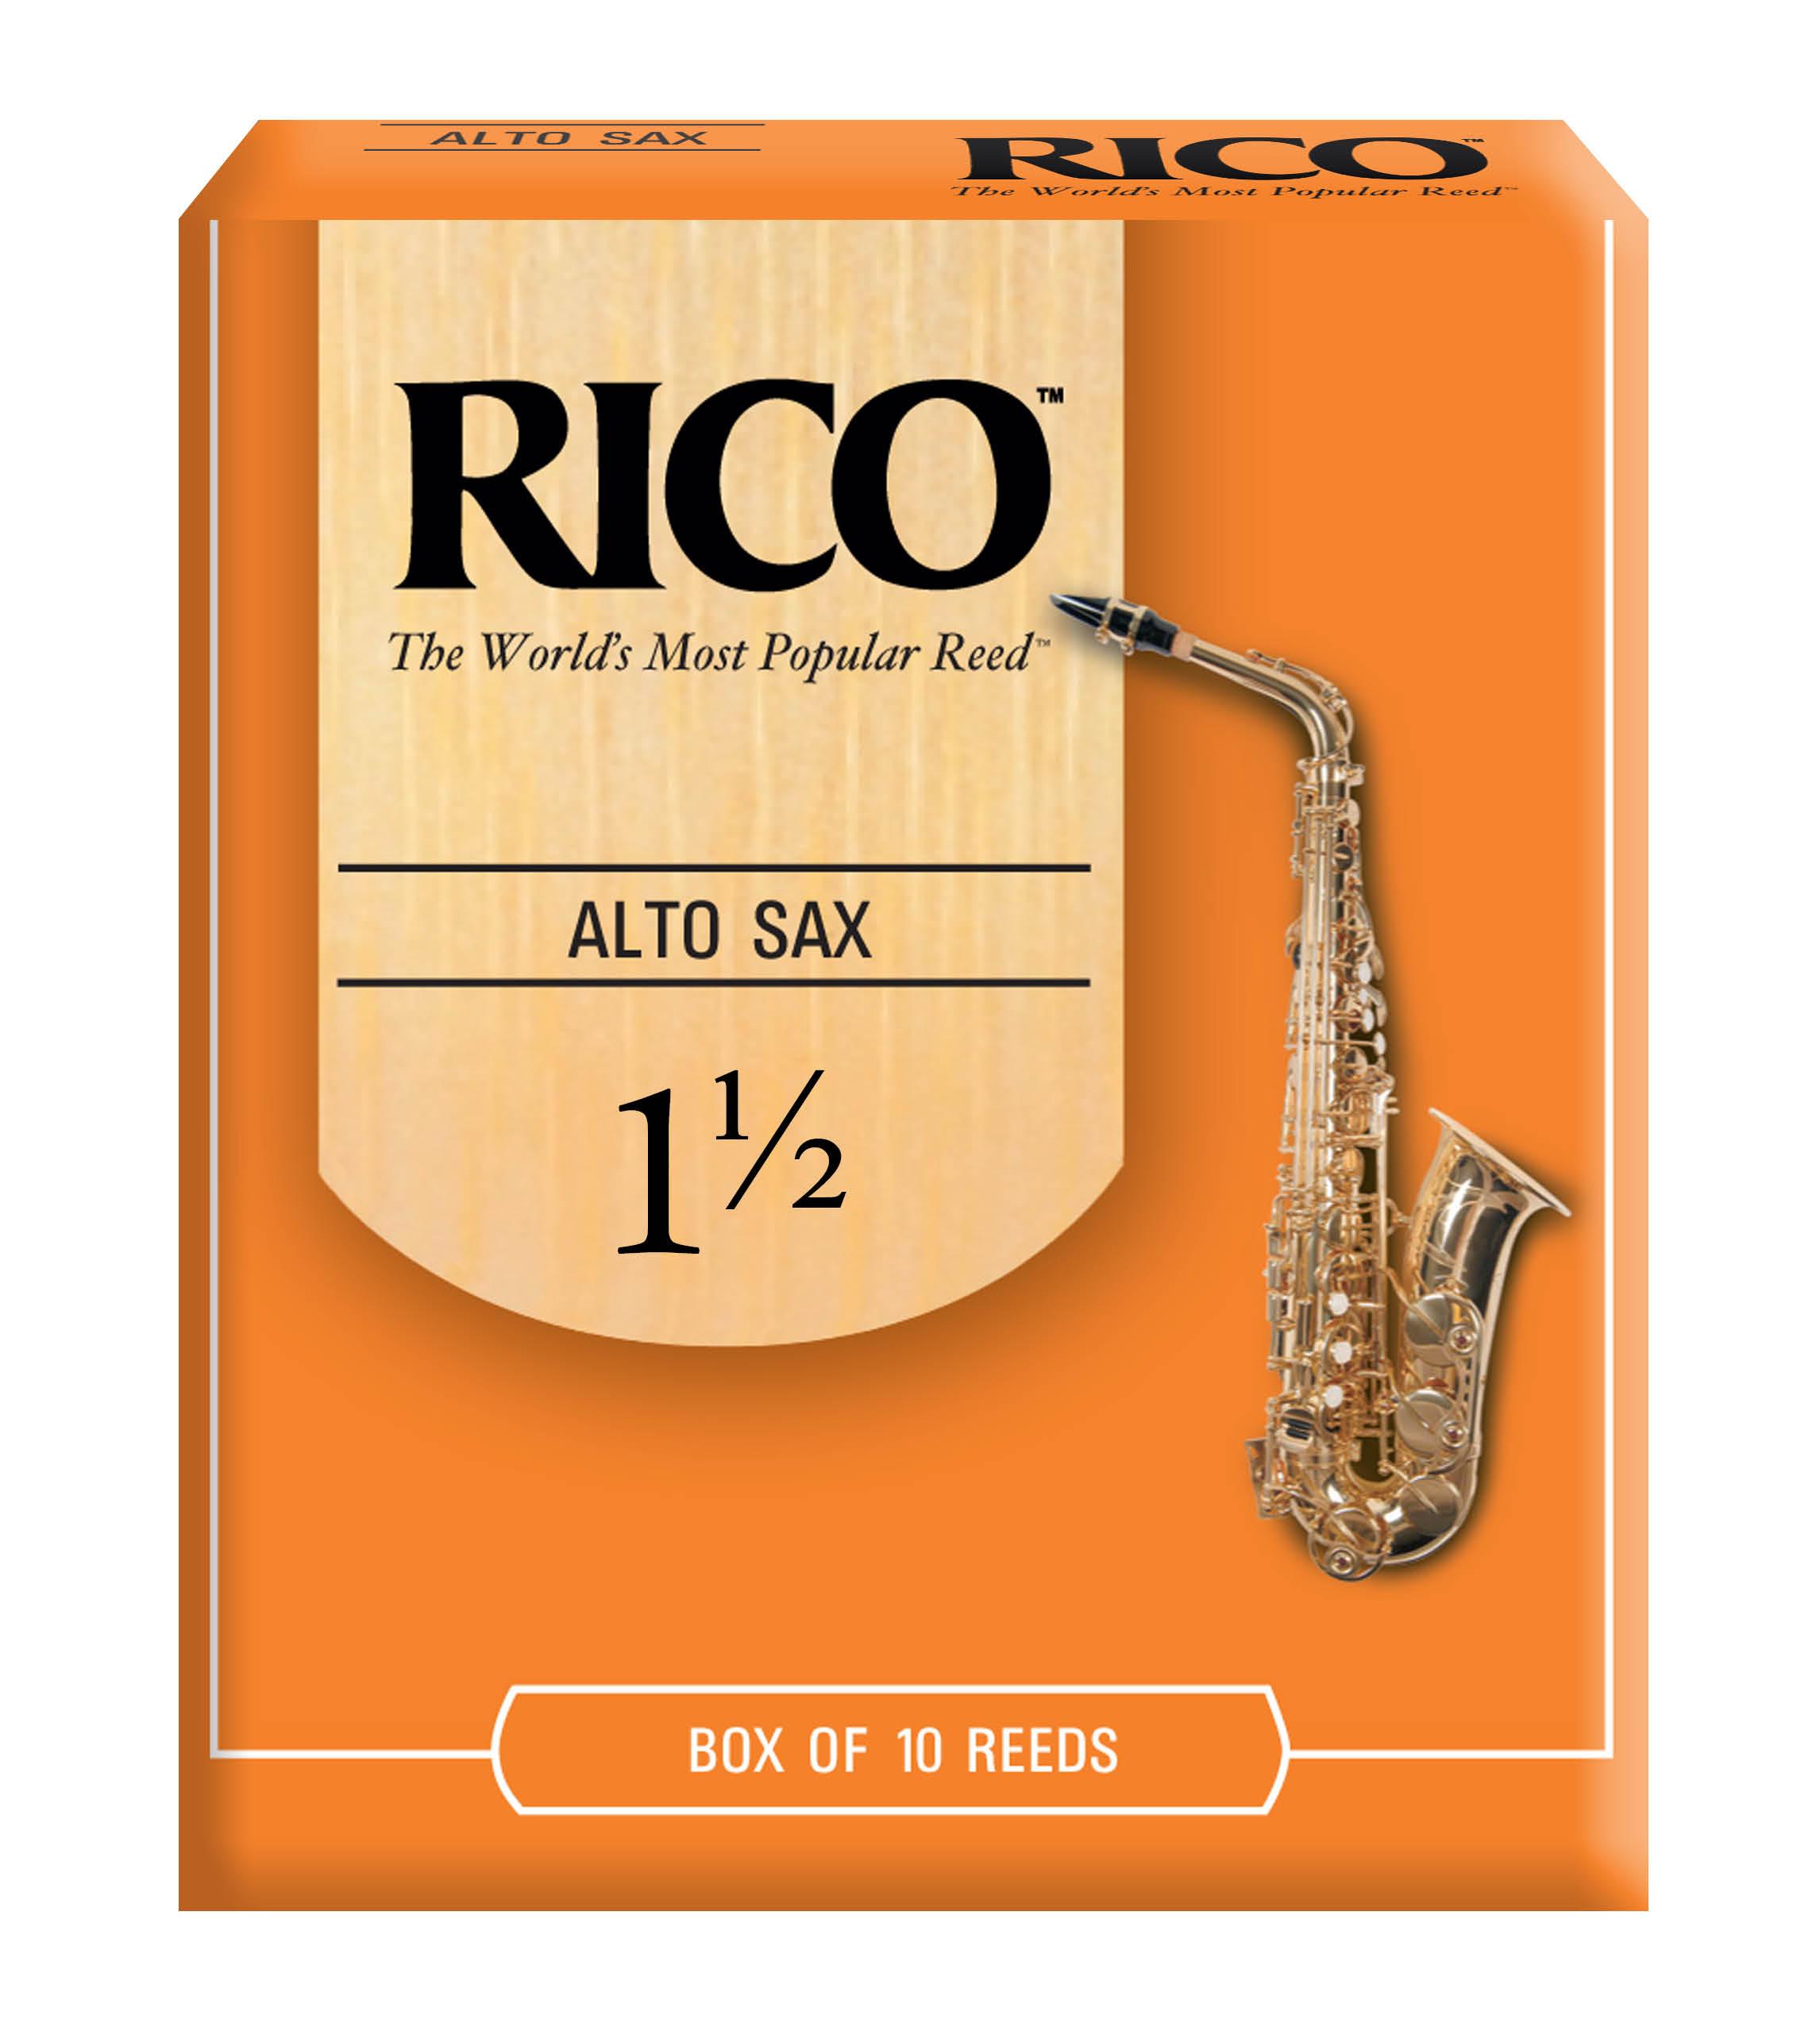 Rico Traditional Orange box